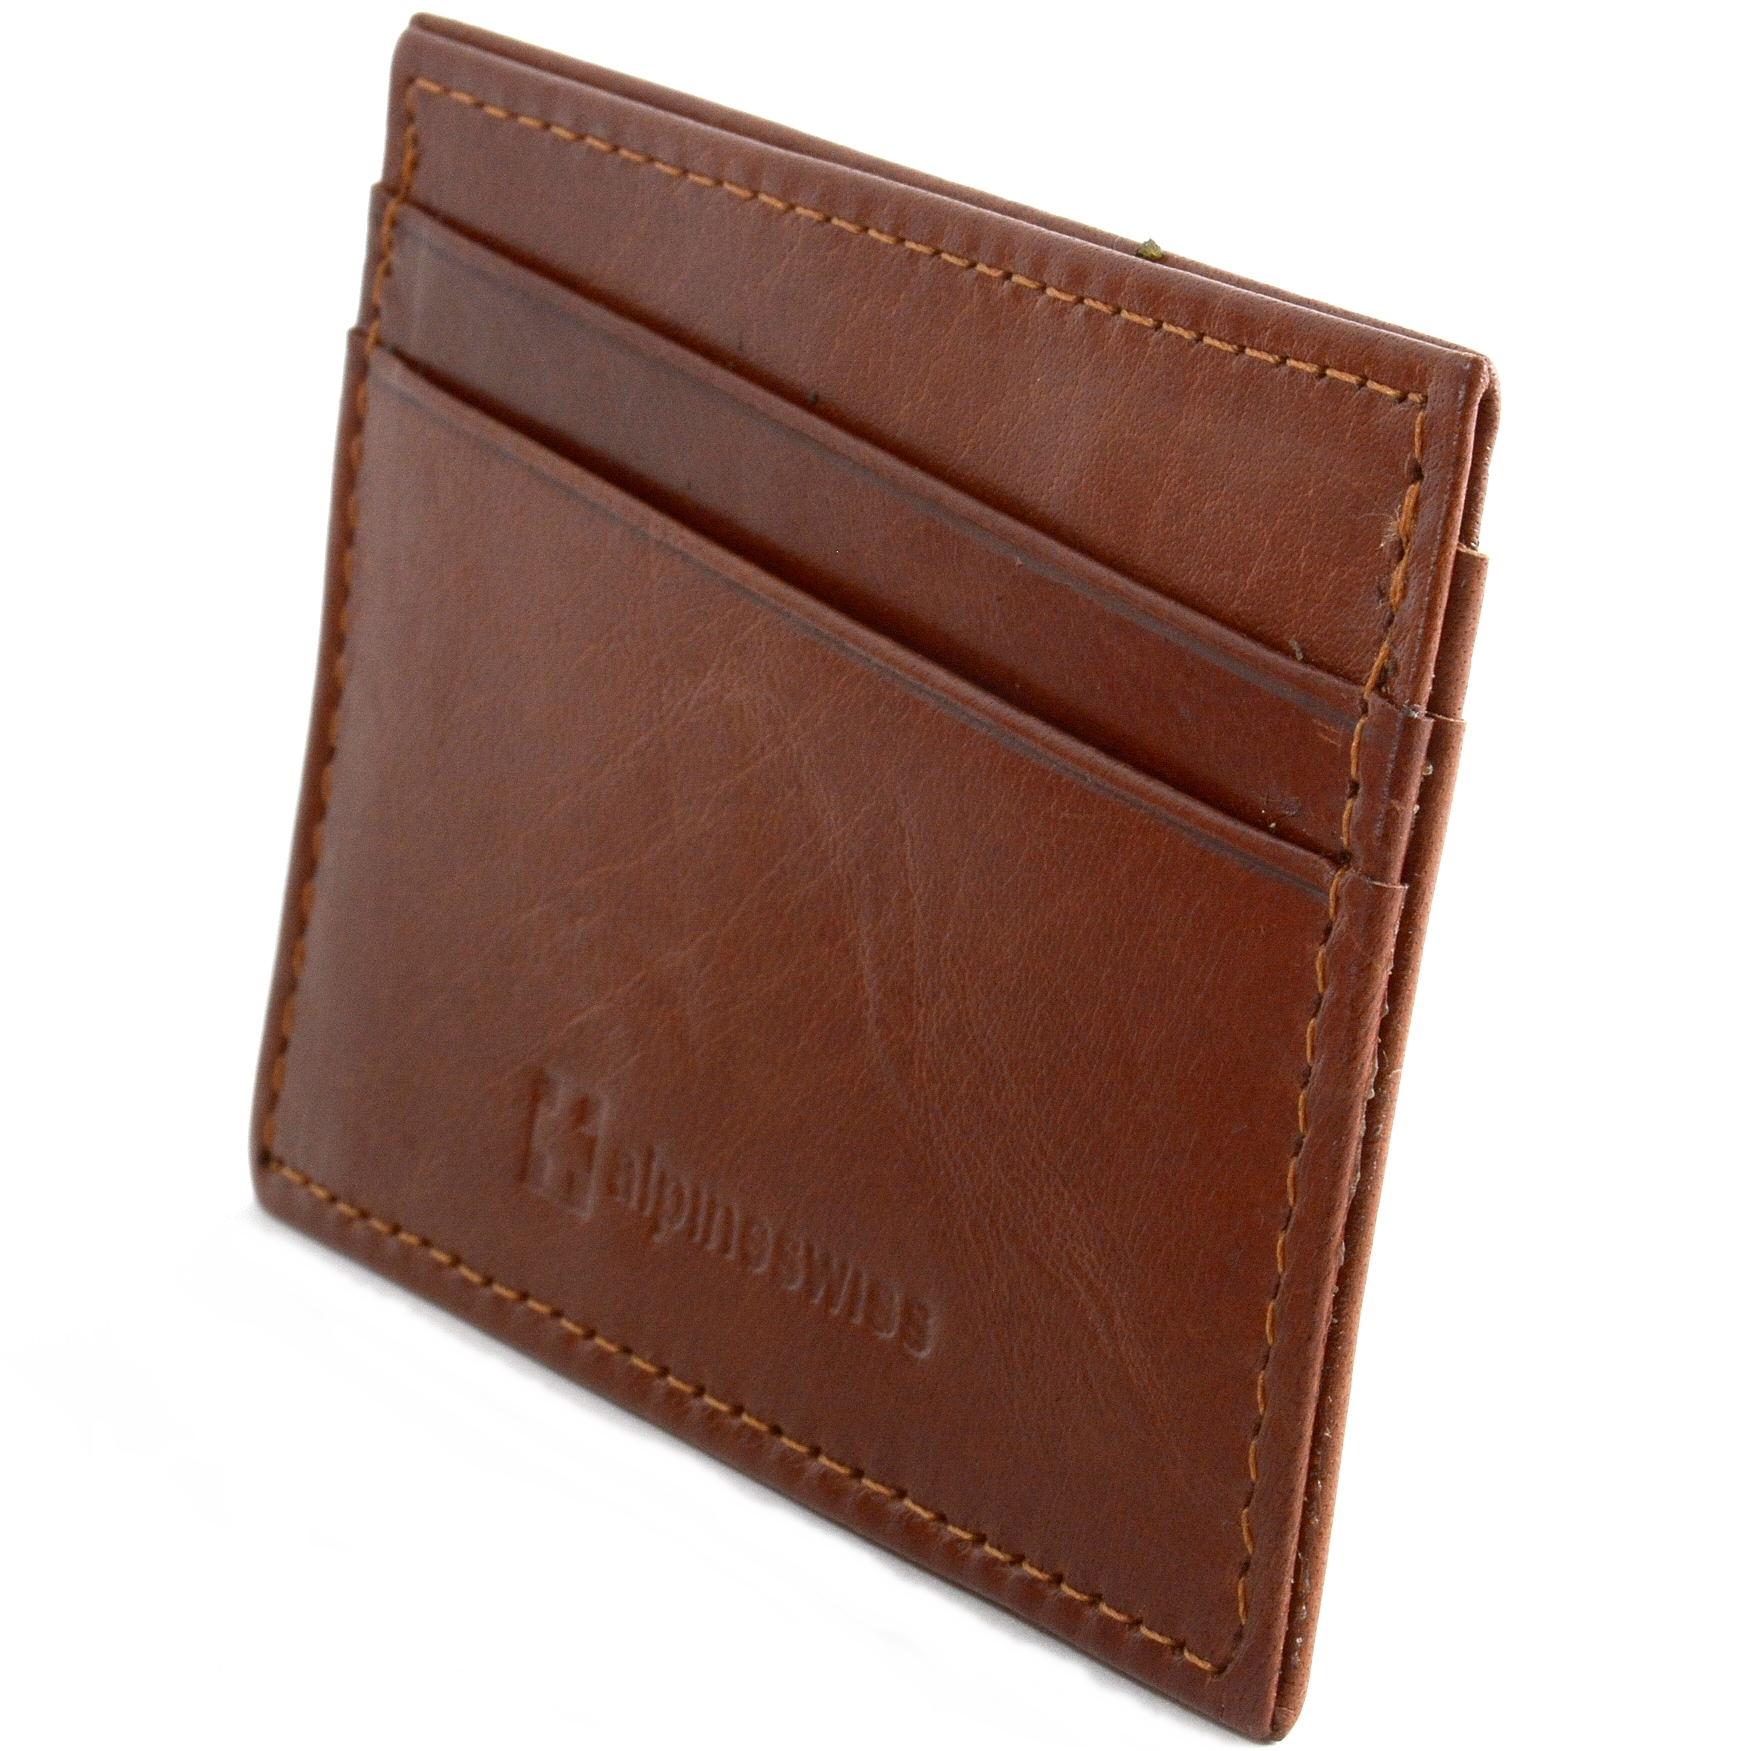 Alpine-Swiss-Minimalist-Leather-Front-Pocket-Wallet-5-Card-Slots-Slim-Thin-Case thumbnail 29